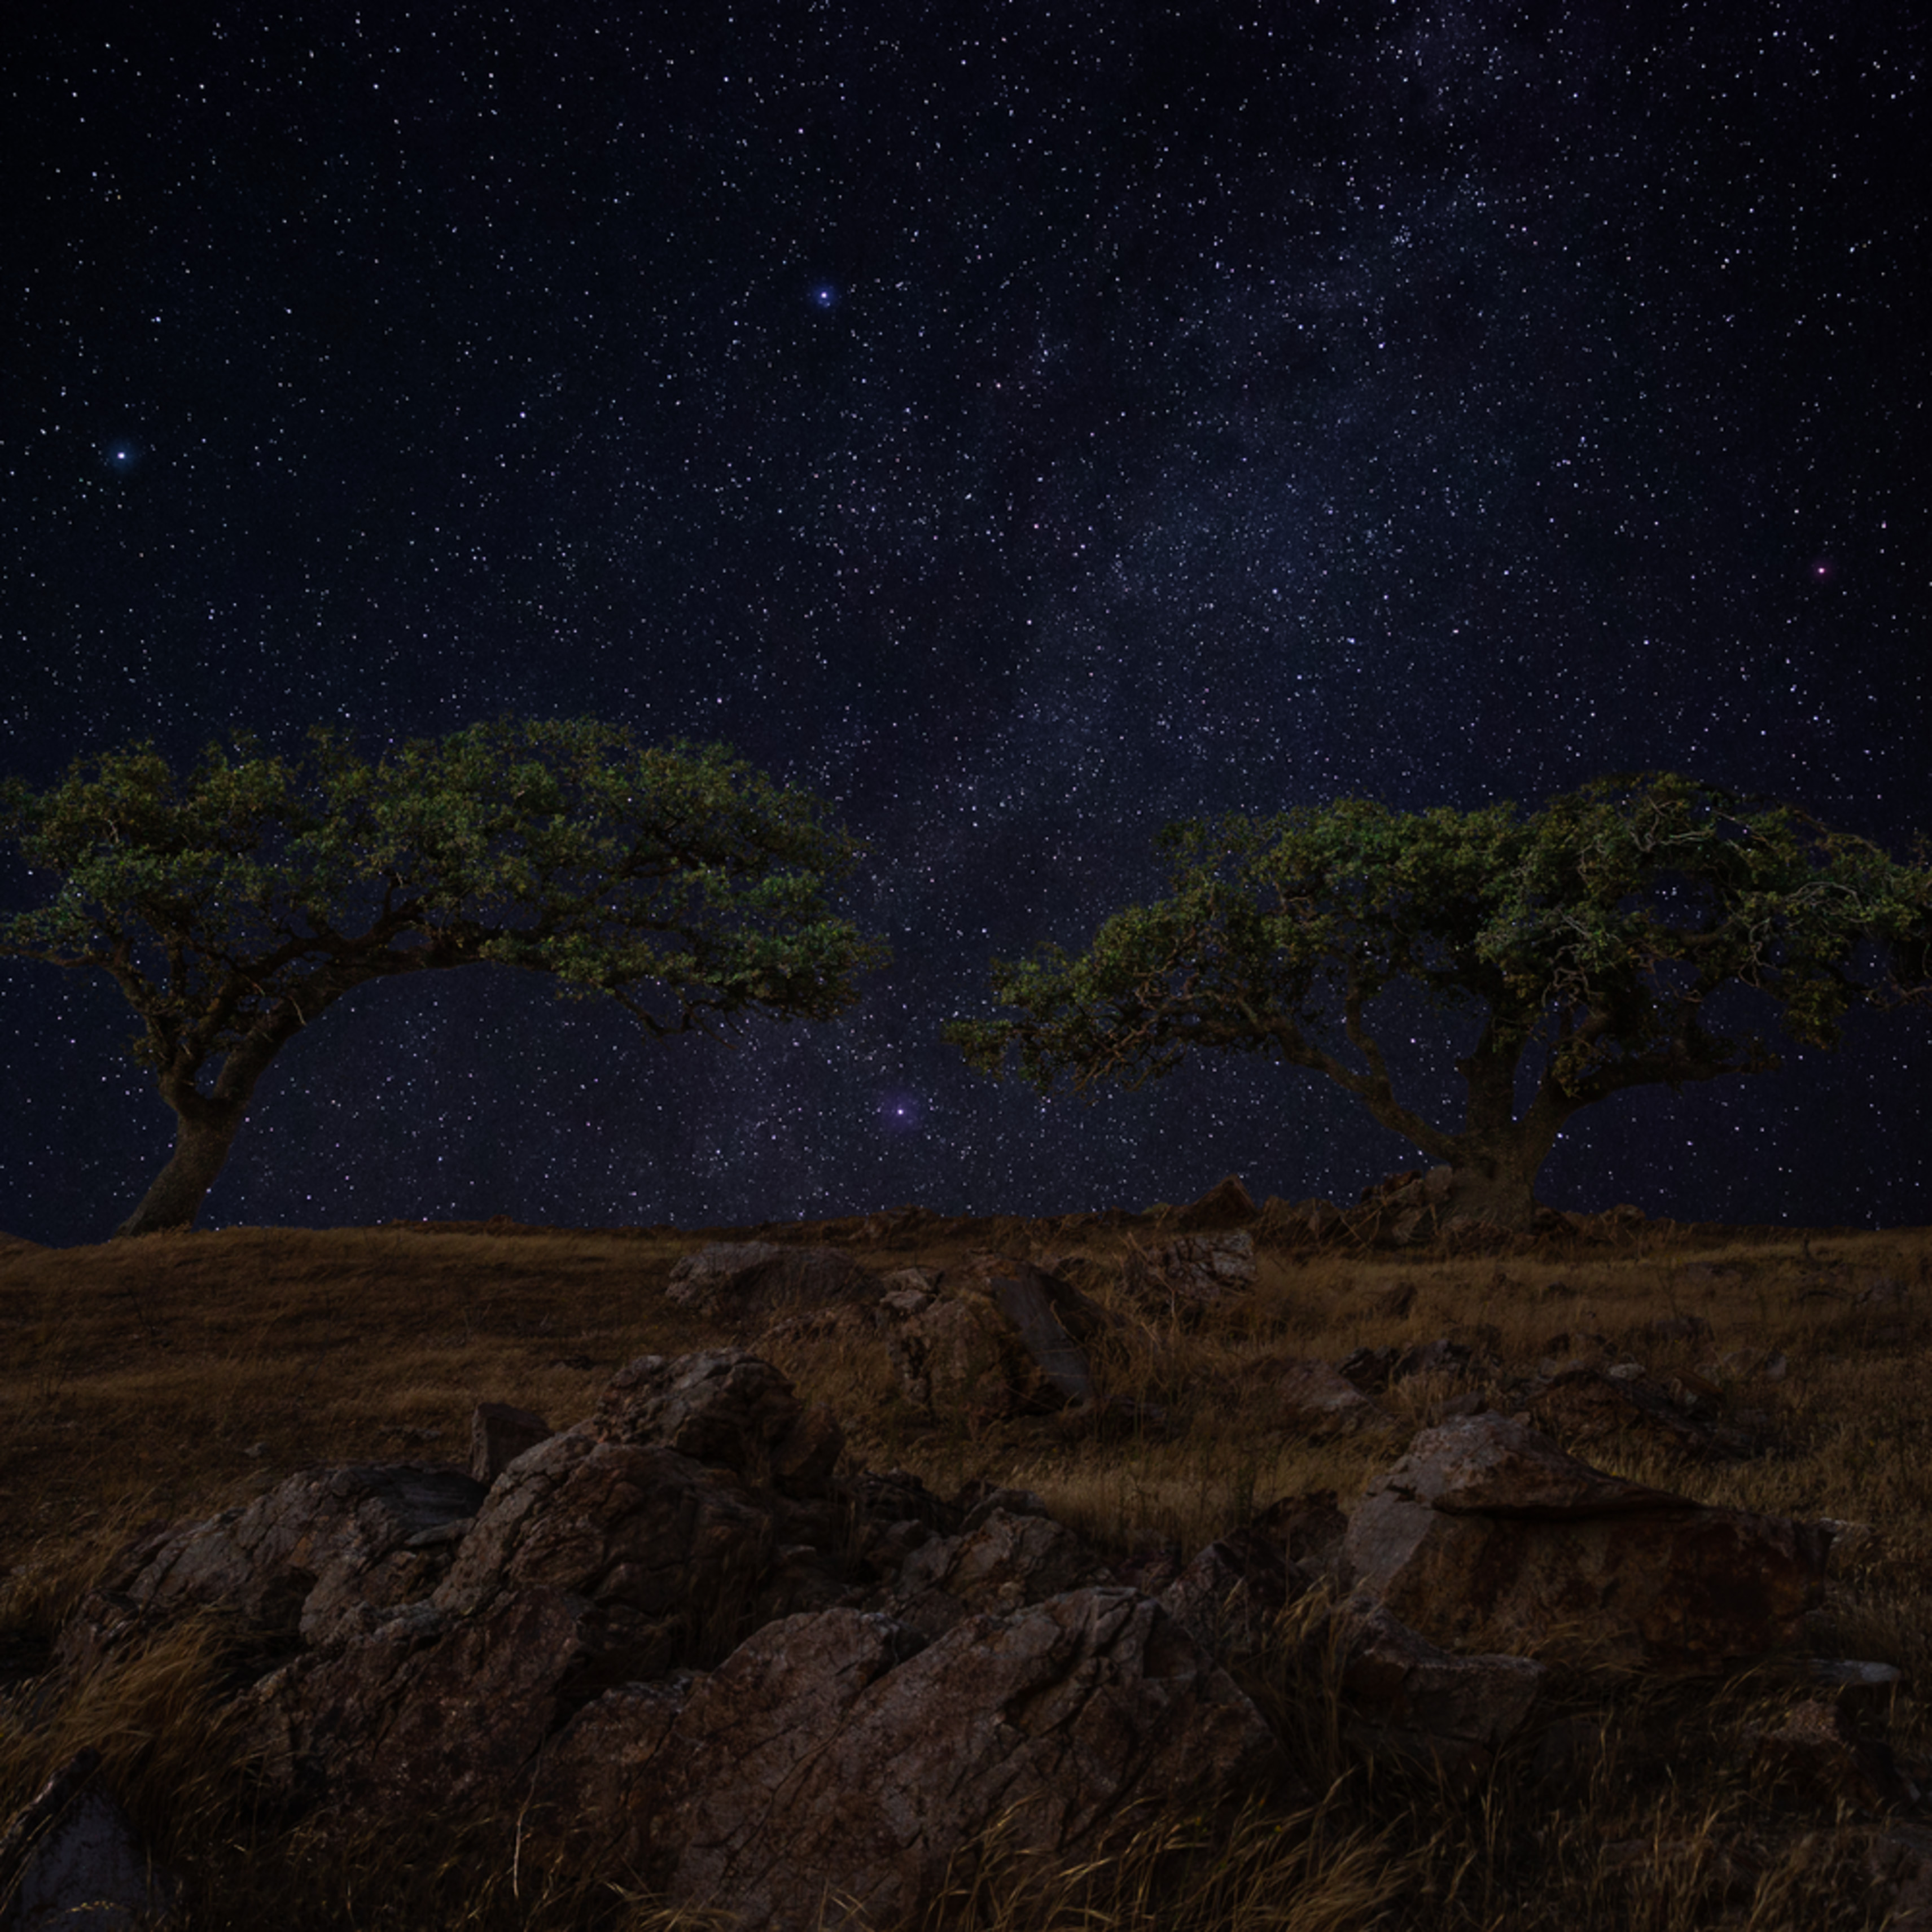 Starry oak solitude khfiw0